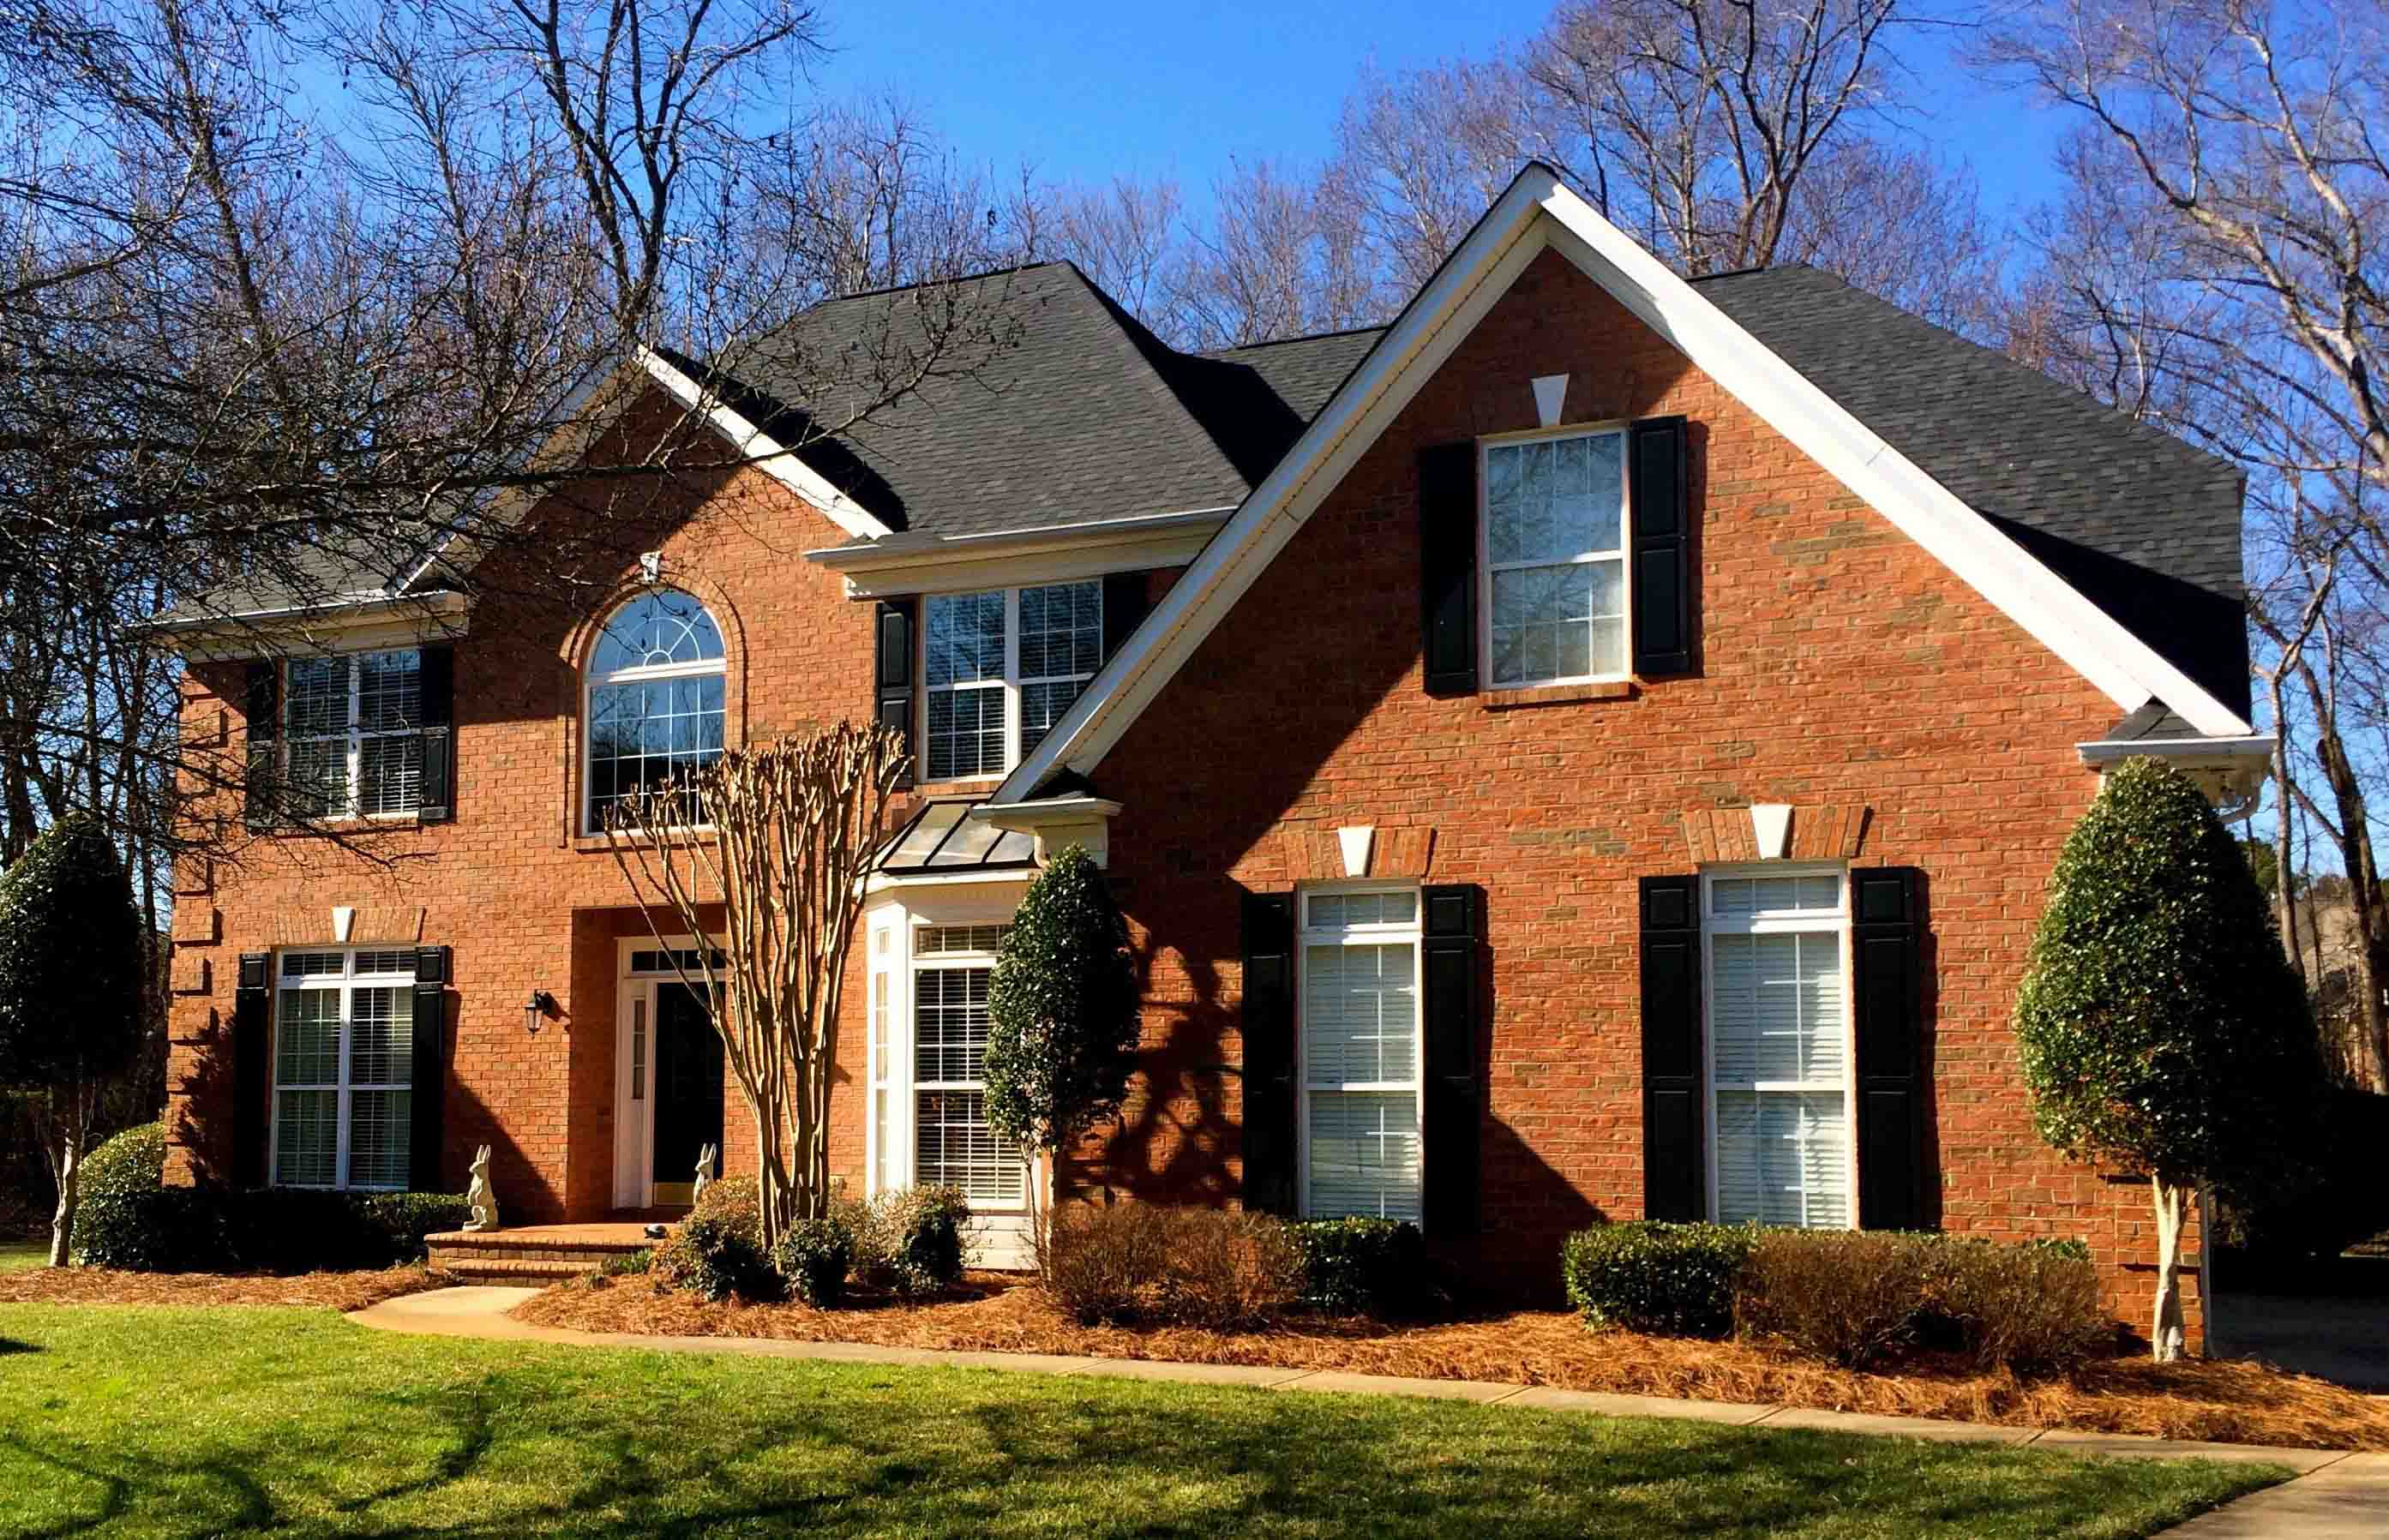 Lighter Color Brick Home Roofing Job